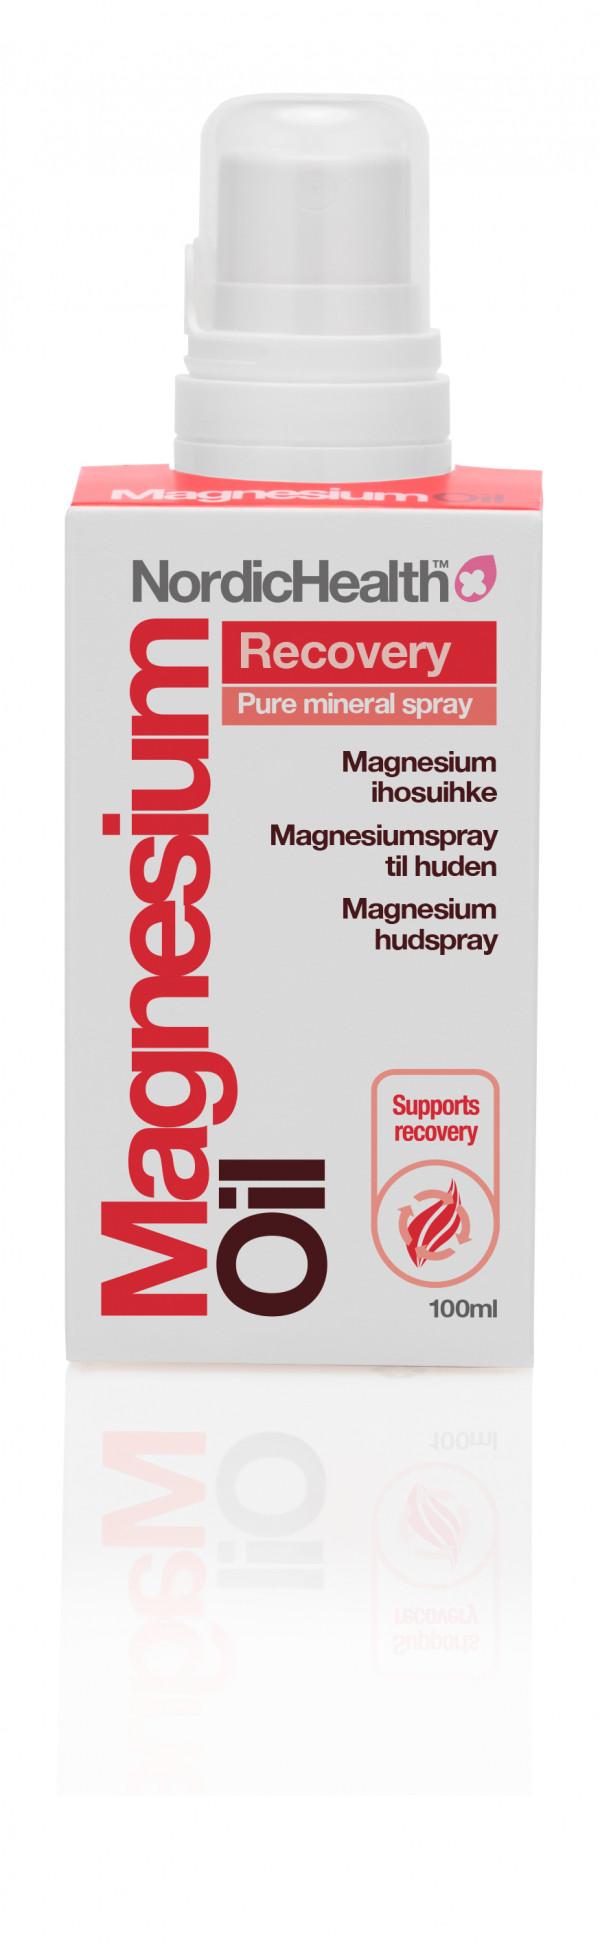 NordicHealth recovery magnesium  ihosuihke 100ml